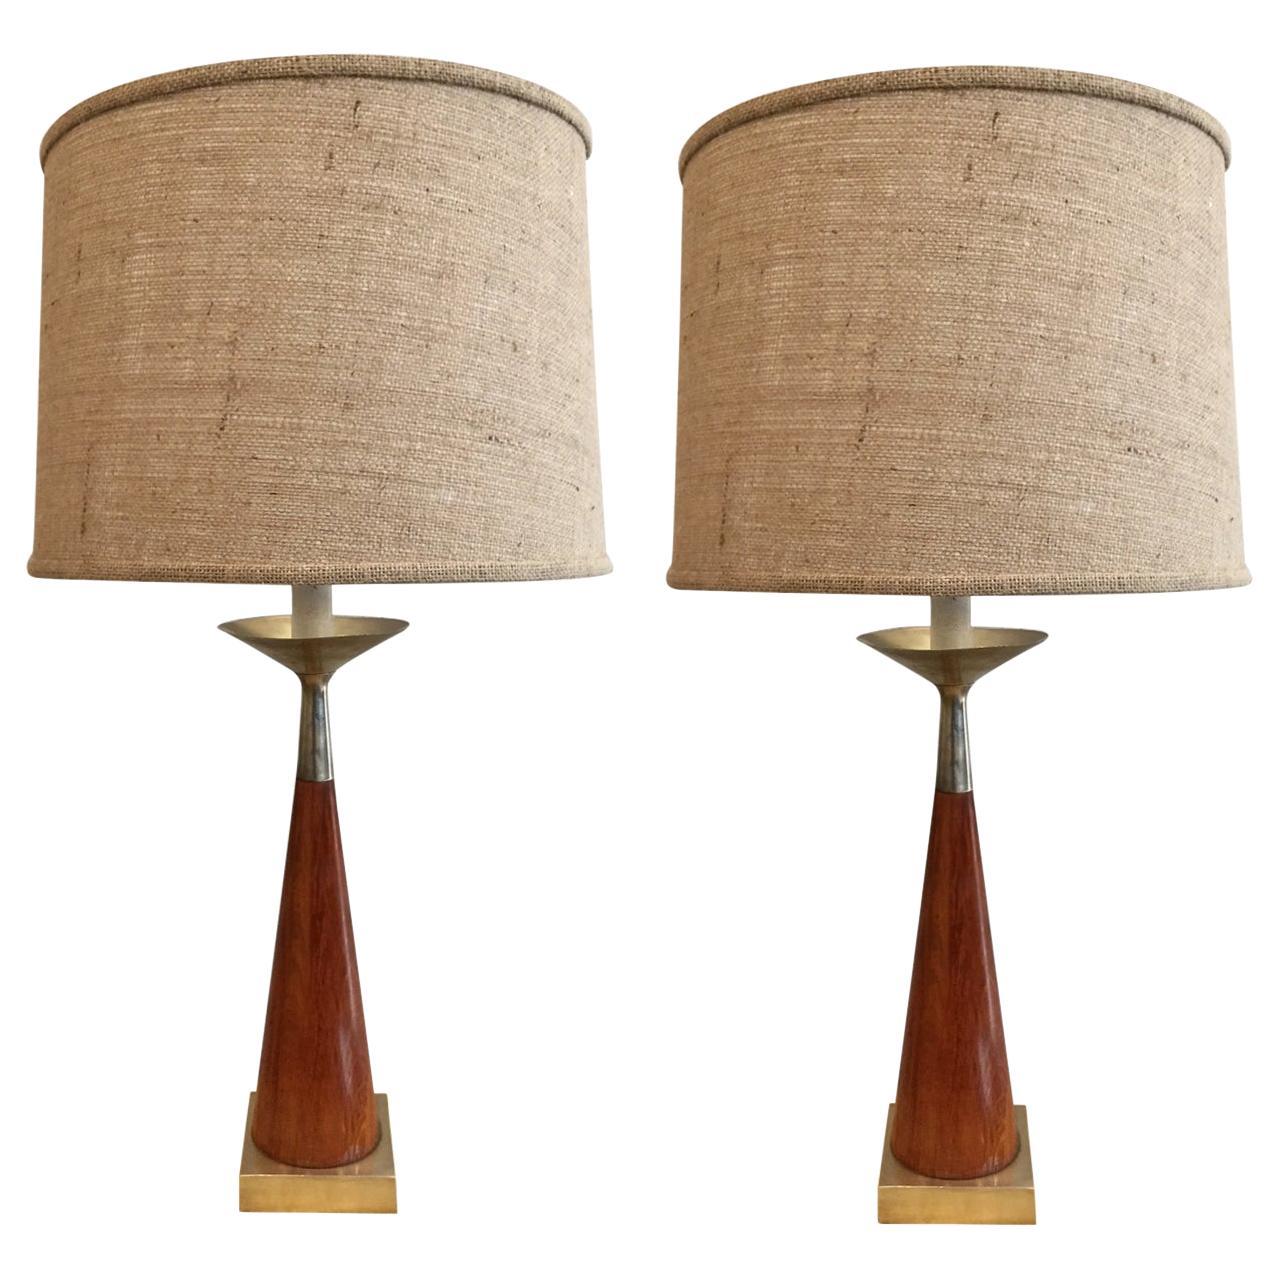 Pair of Tony Paul Brass and Walnut Lamps